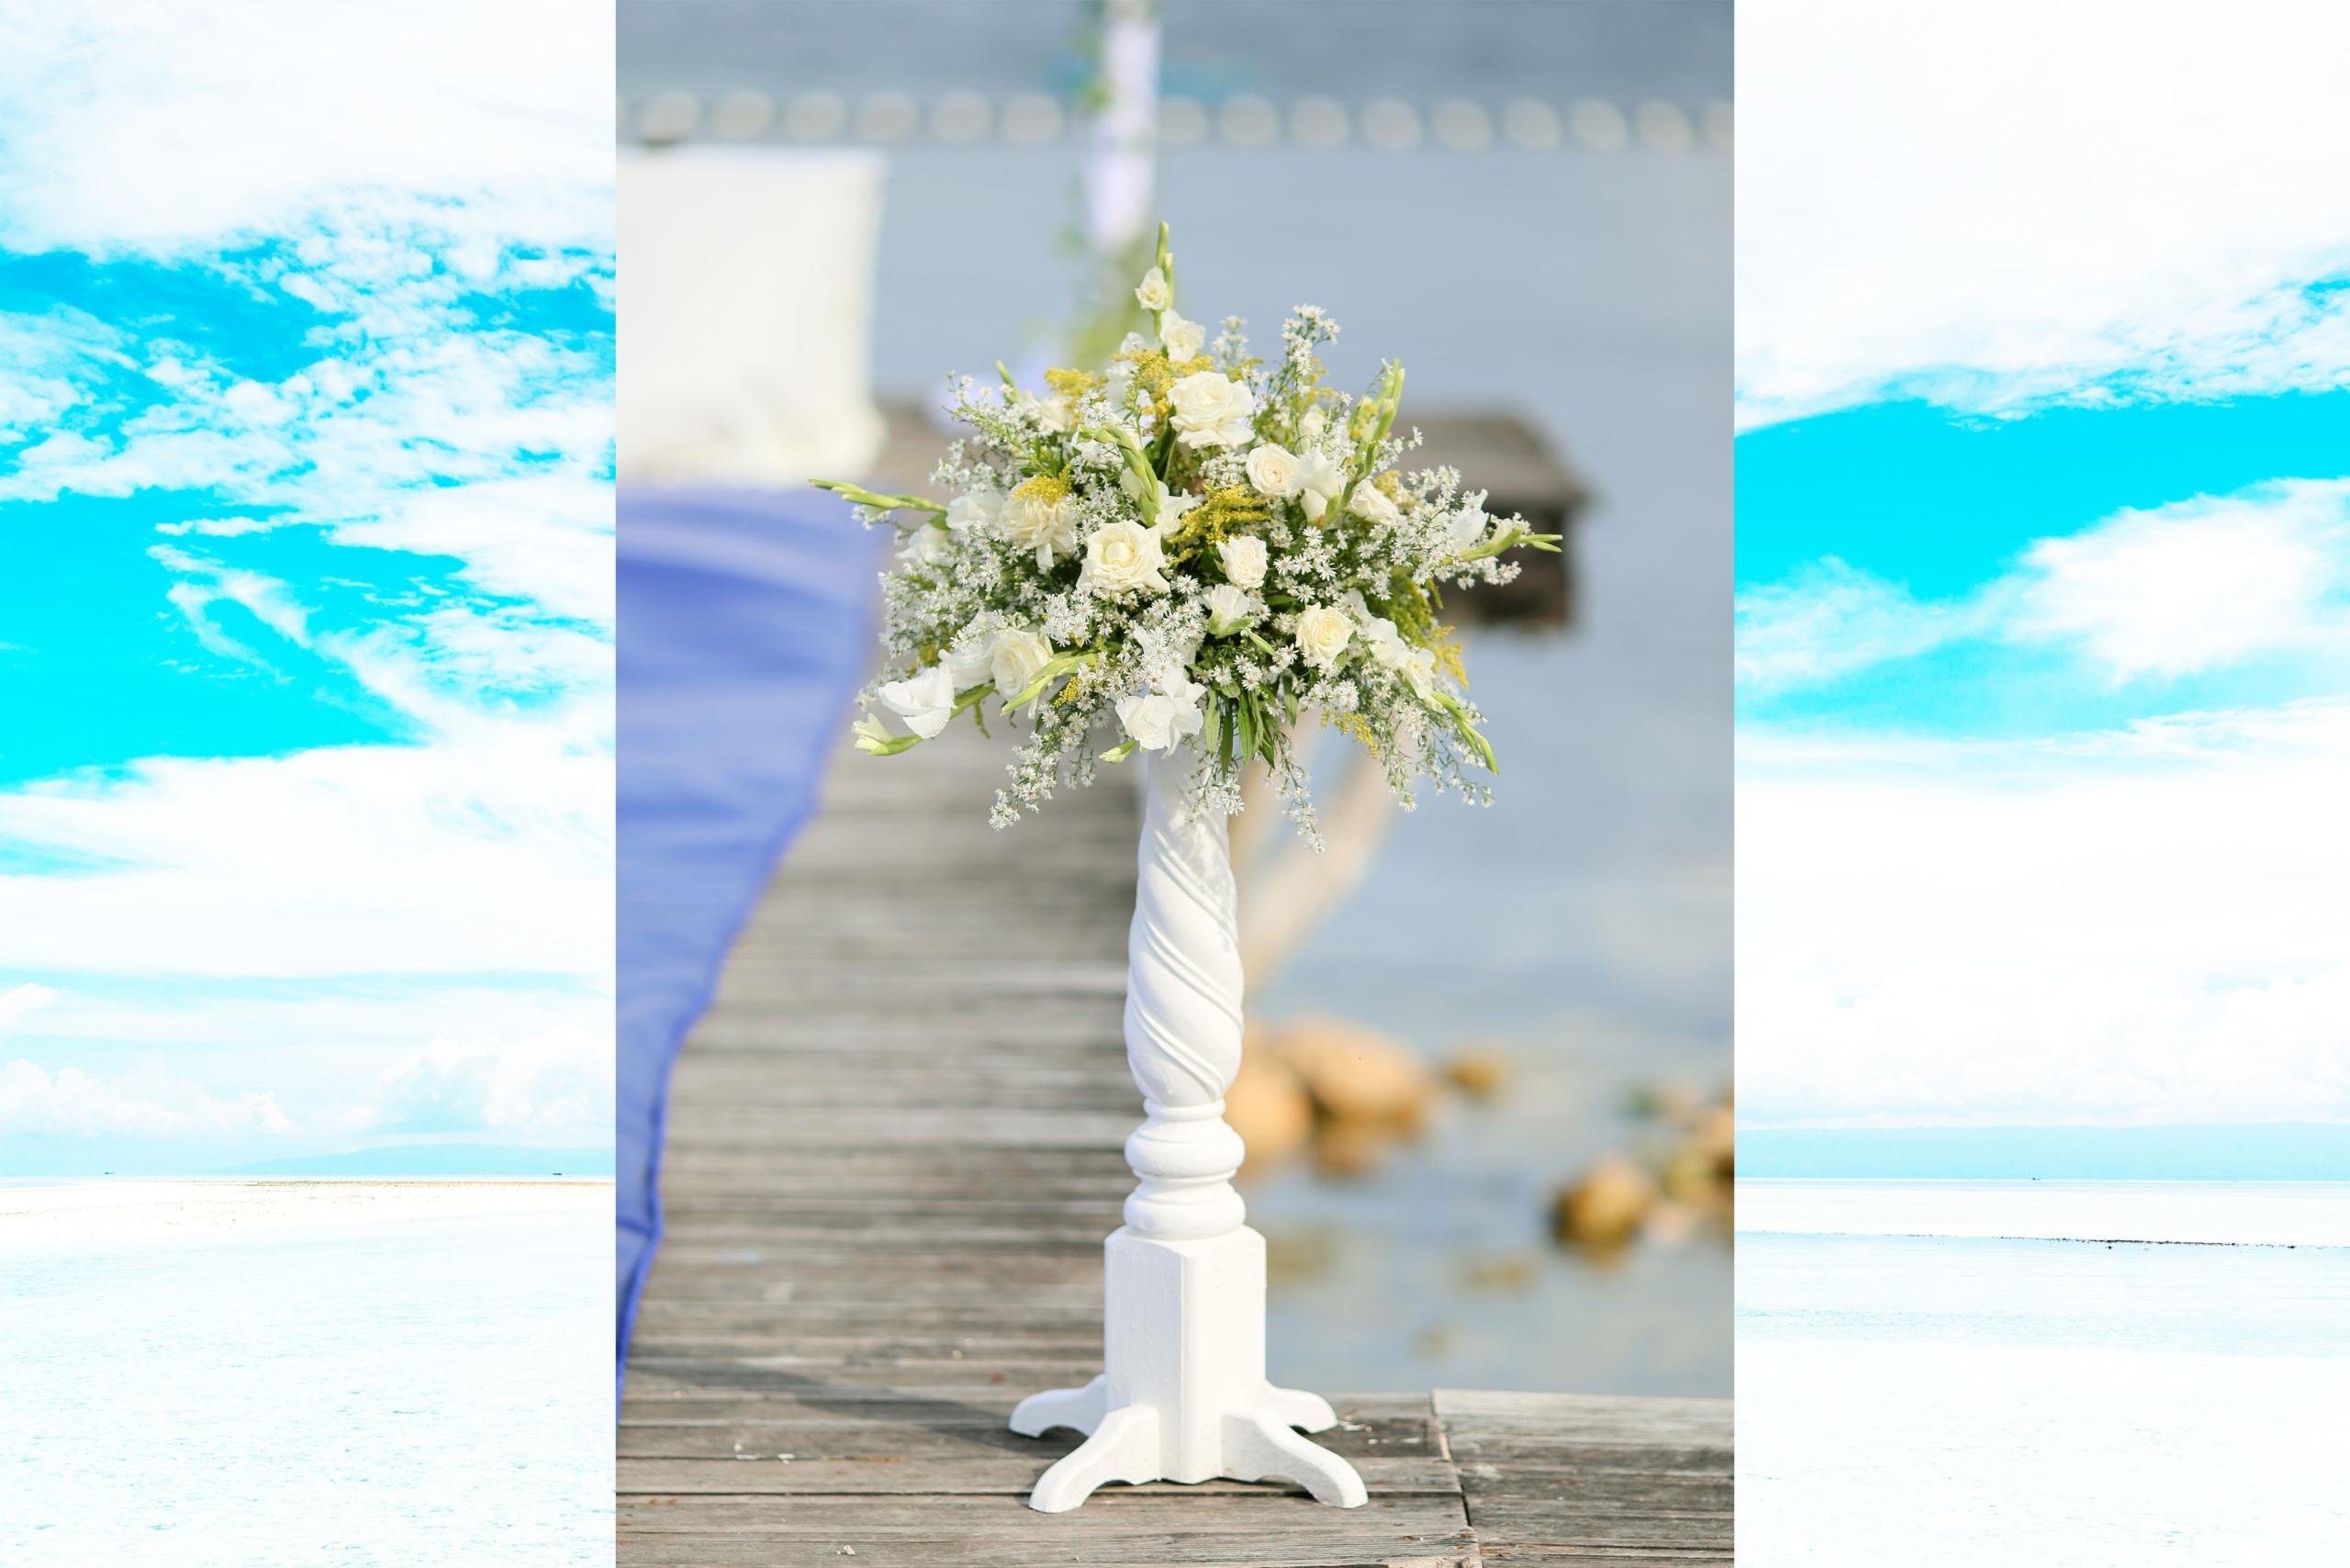 cebu-wedding-decoration (1)